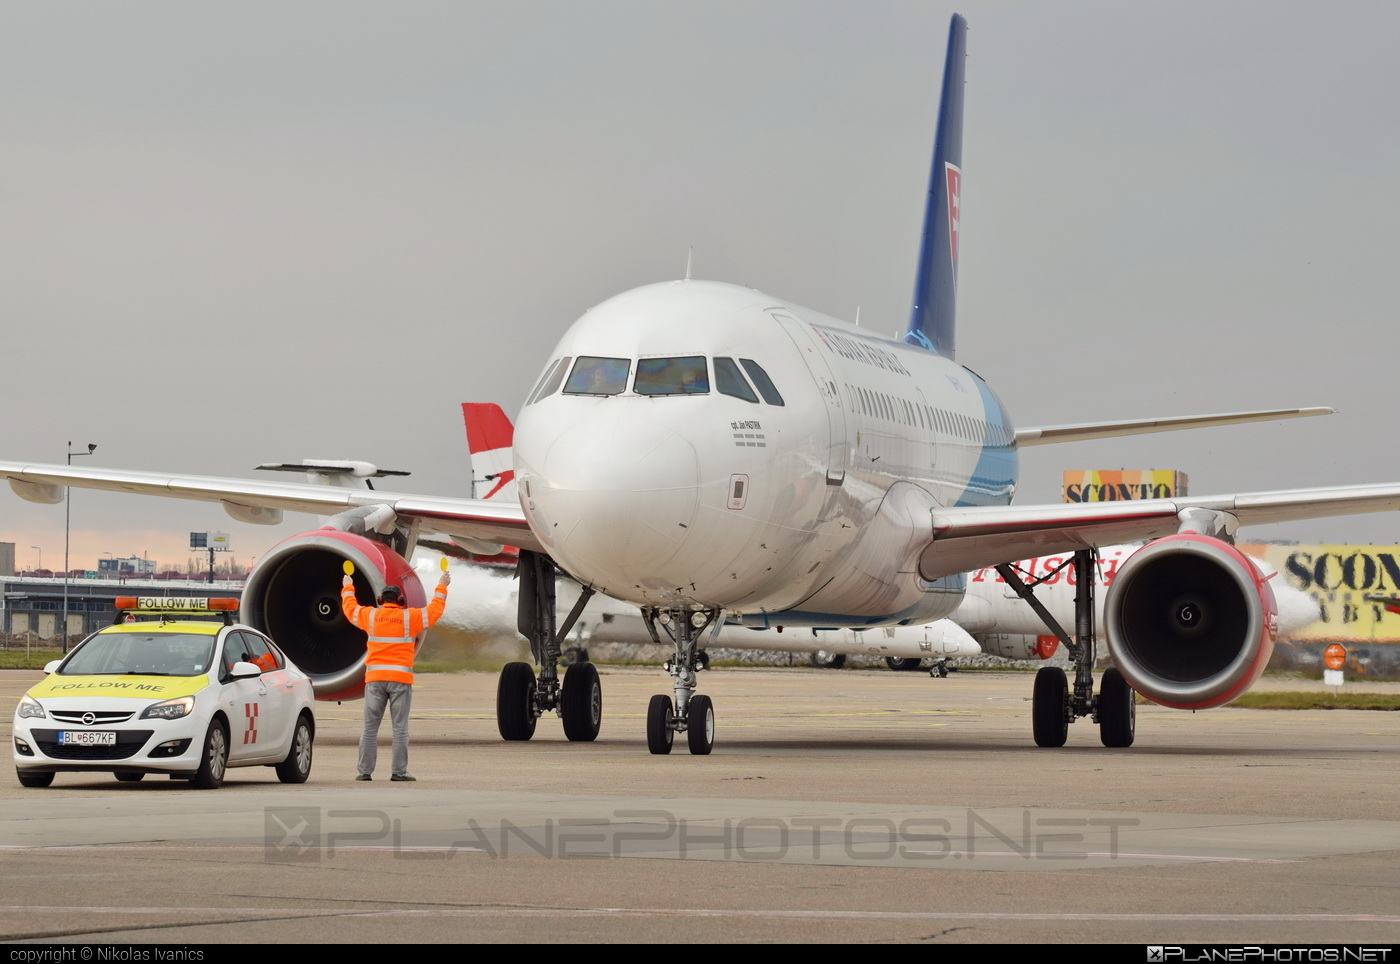 Airbus ACJ319-115X - OM-BYK operated by Letecký útvar MV SR (Slovak Government Flying Service) #SlovakGovernmentFlyingService #acj319 #acj319115x #airbus #airbuscorporatejet #leteckyutvarMVSR